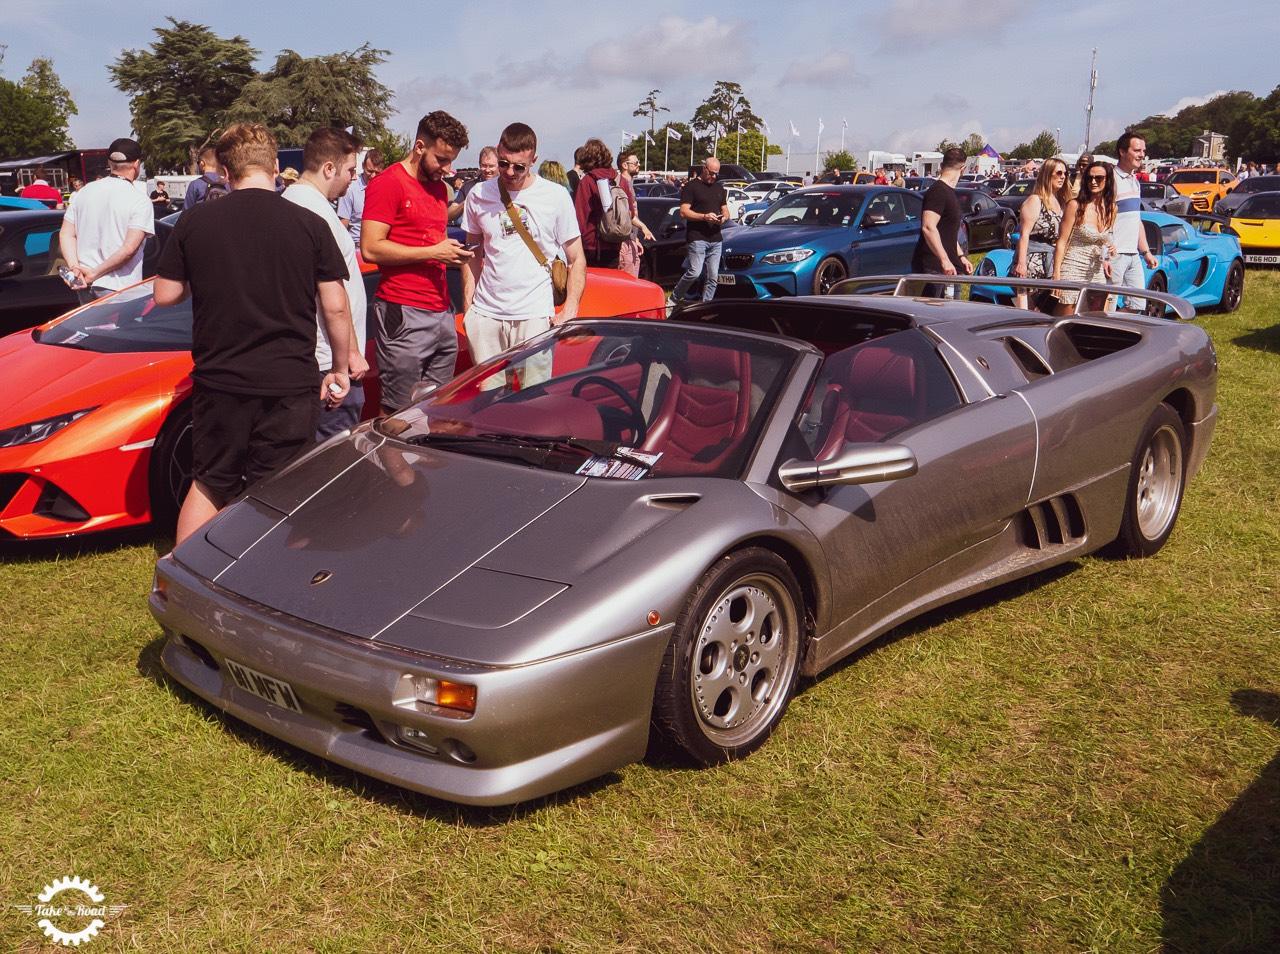 Goodwood Festival of Speed makes a triumphant return